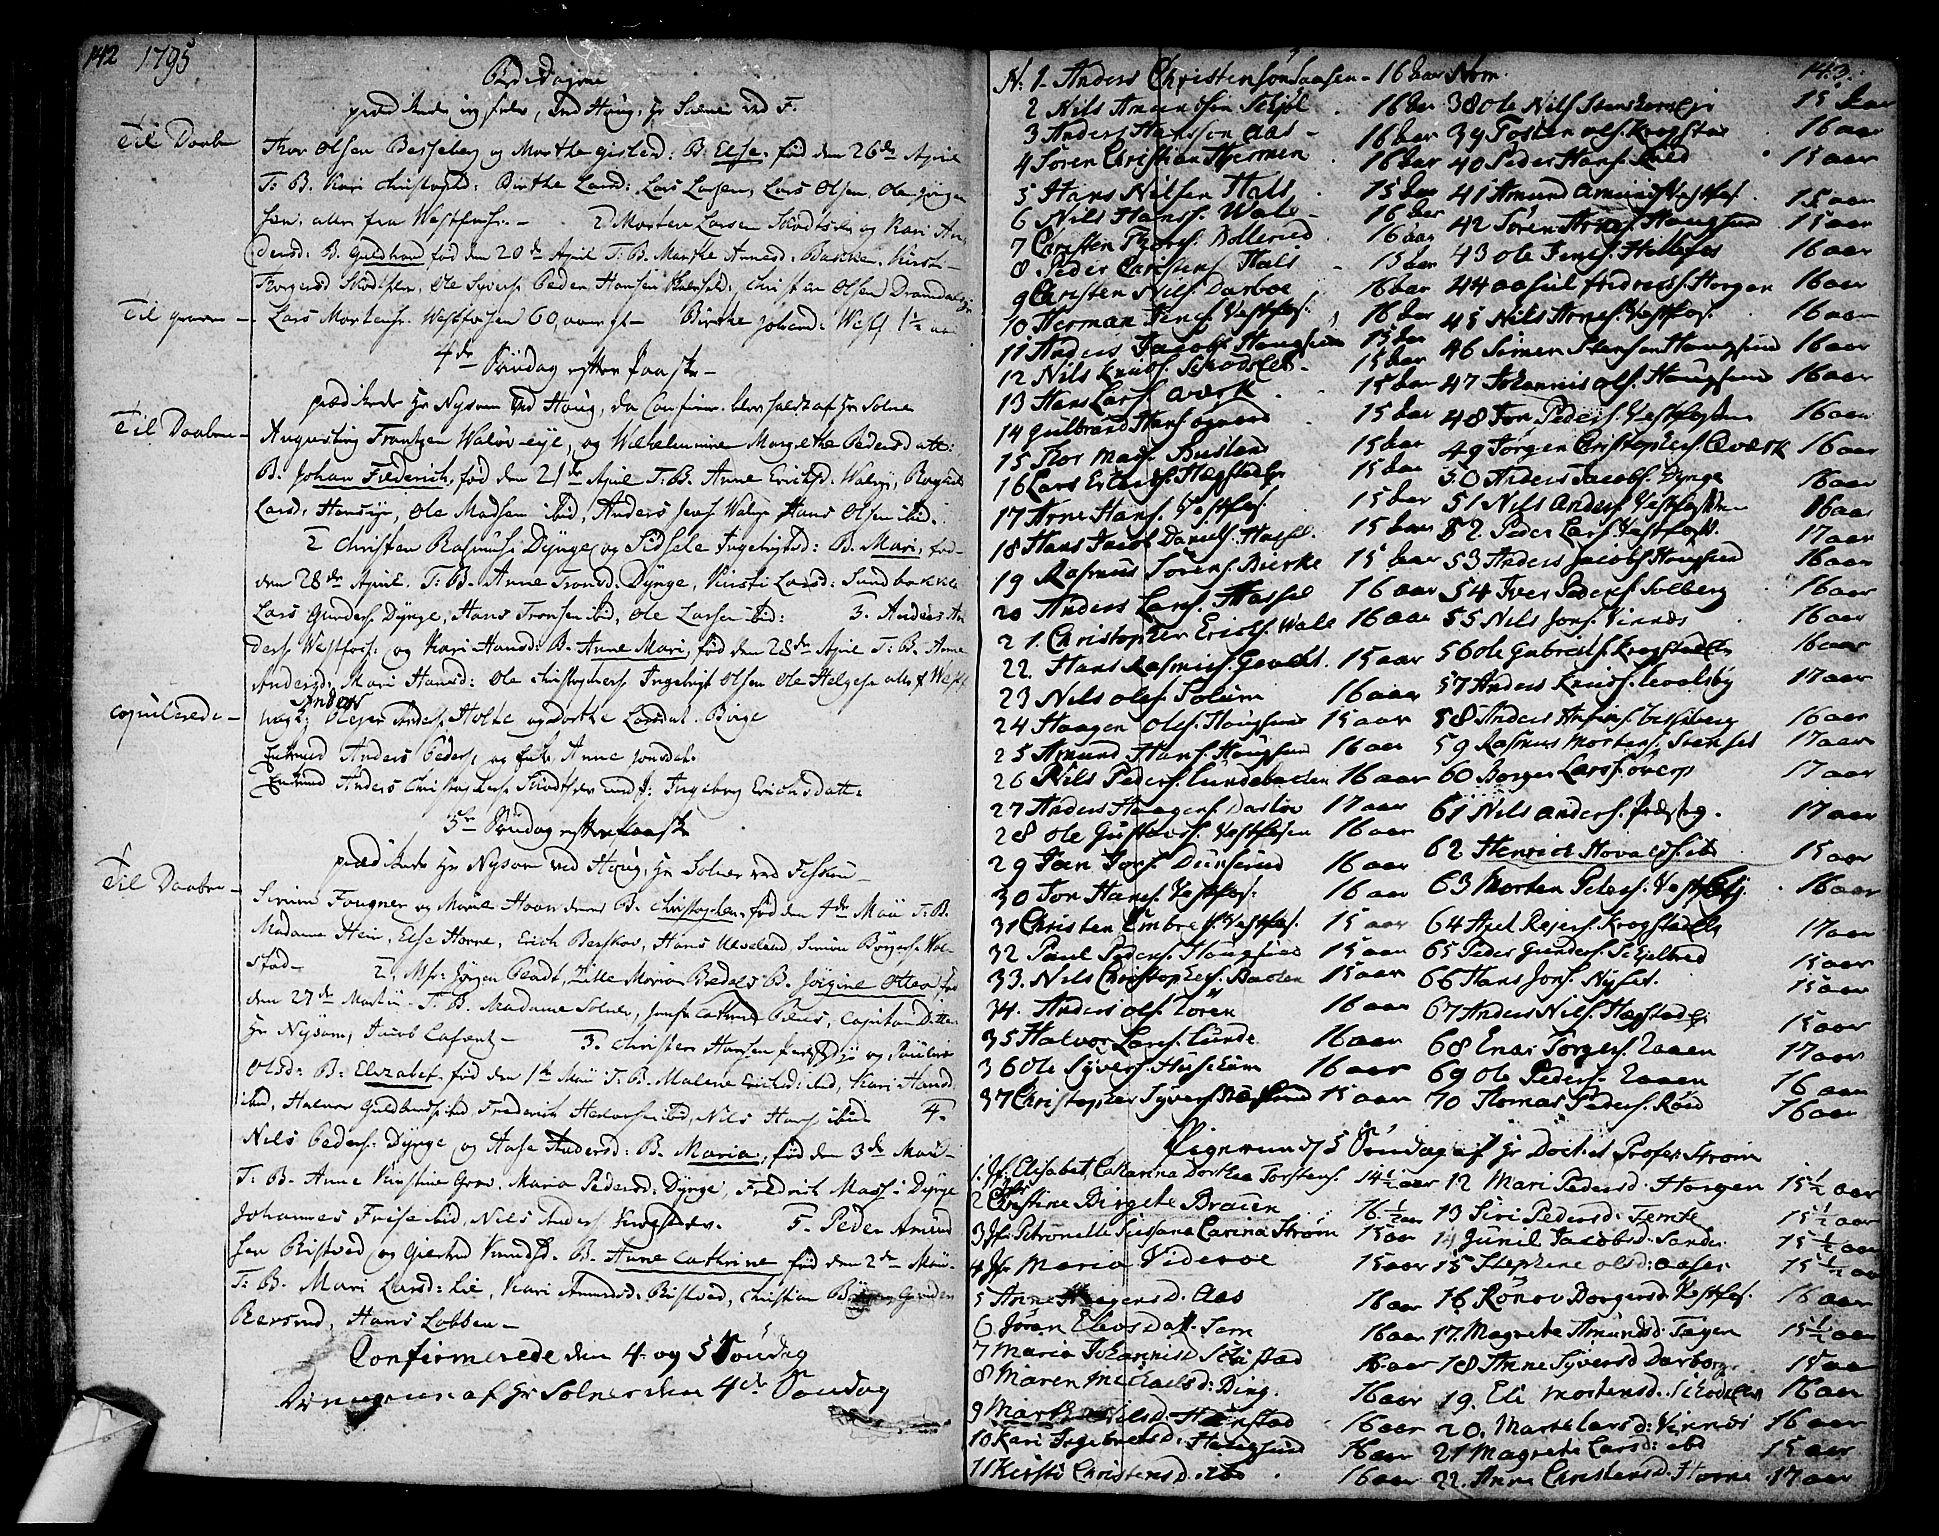 SAKO, Eiker kirkebøker, F/Fa/L0009: Ministerialbok nr. I 9, 1789-1806, s. 142-143